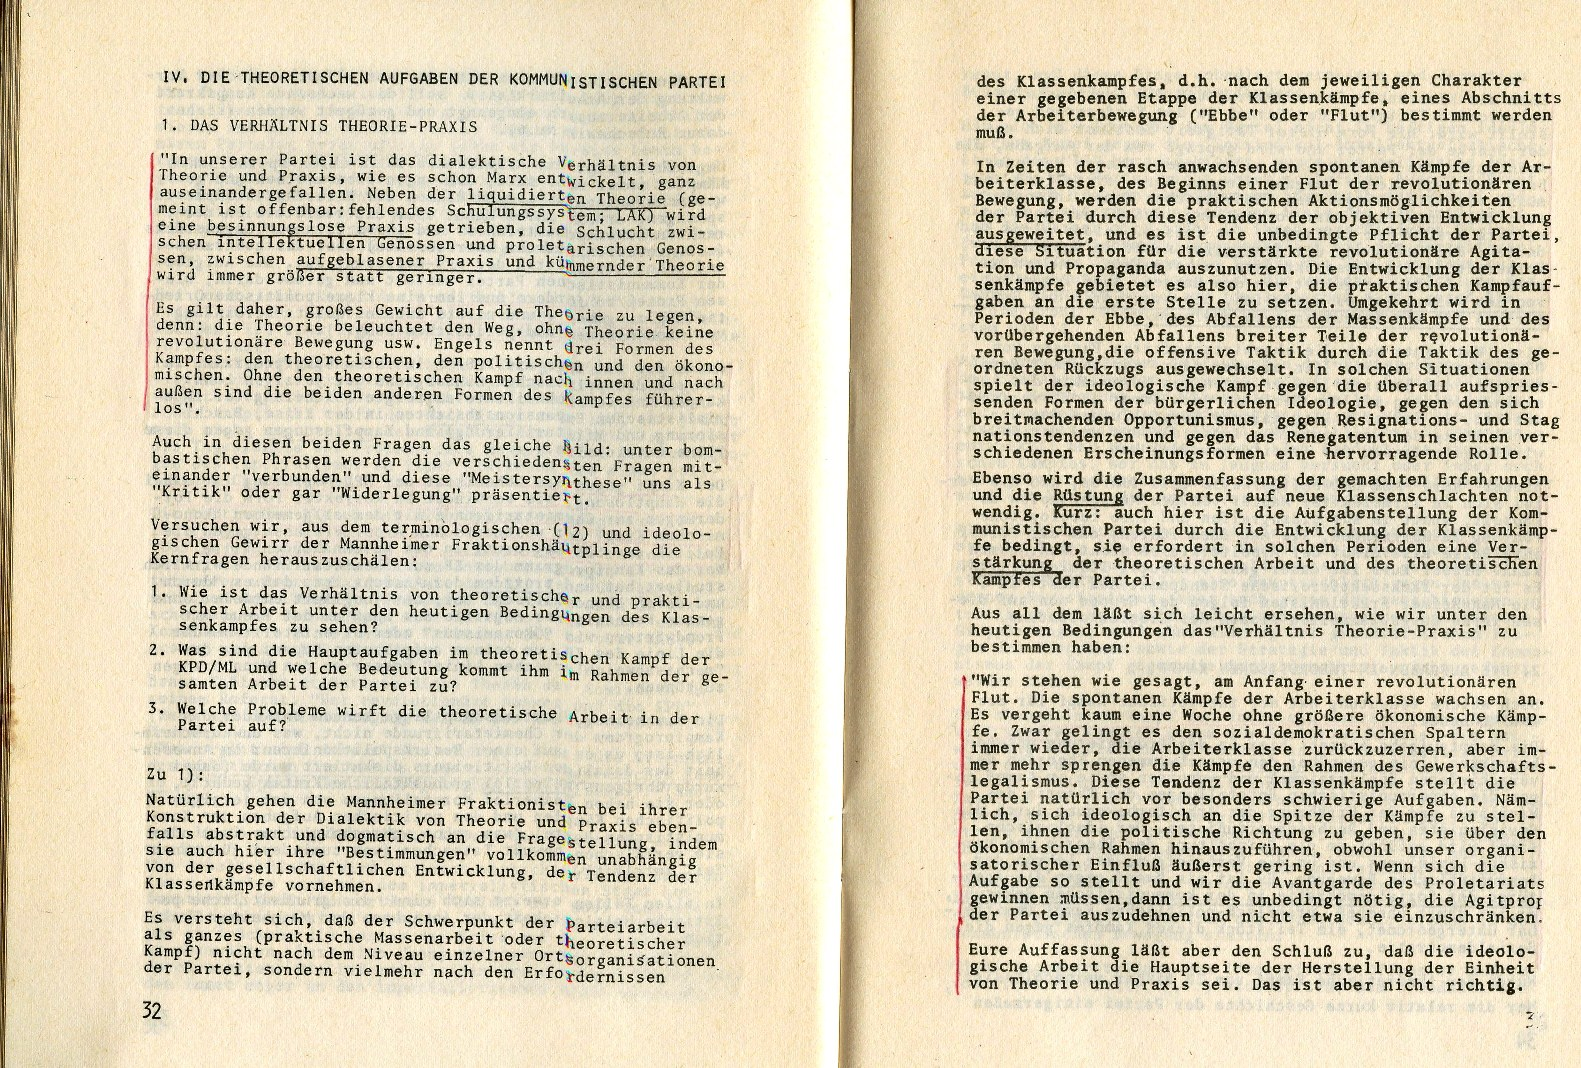 ZB_Parteiarbeiter_1971_05_18